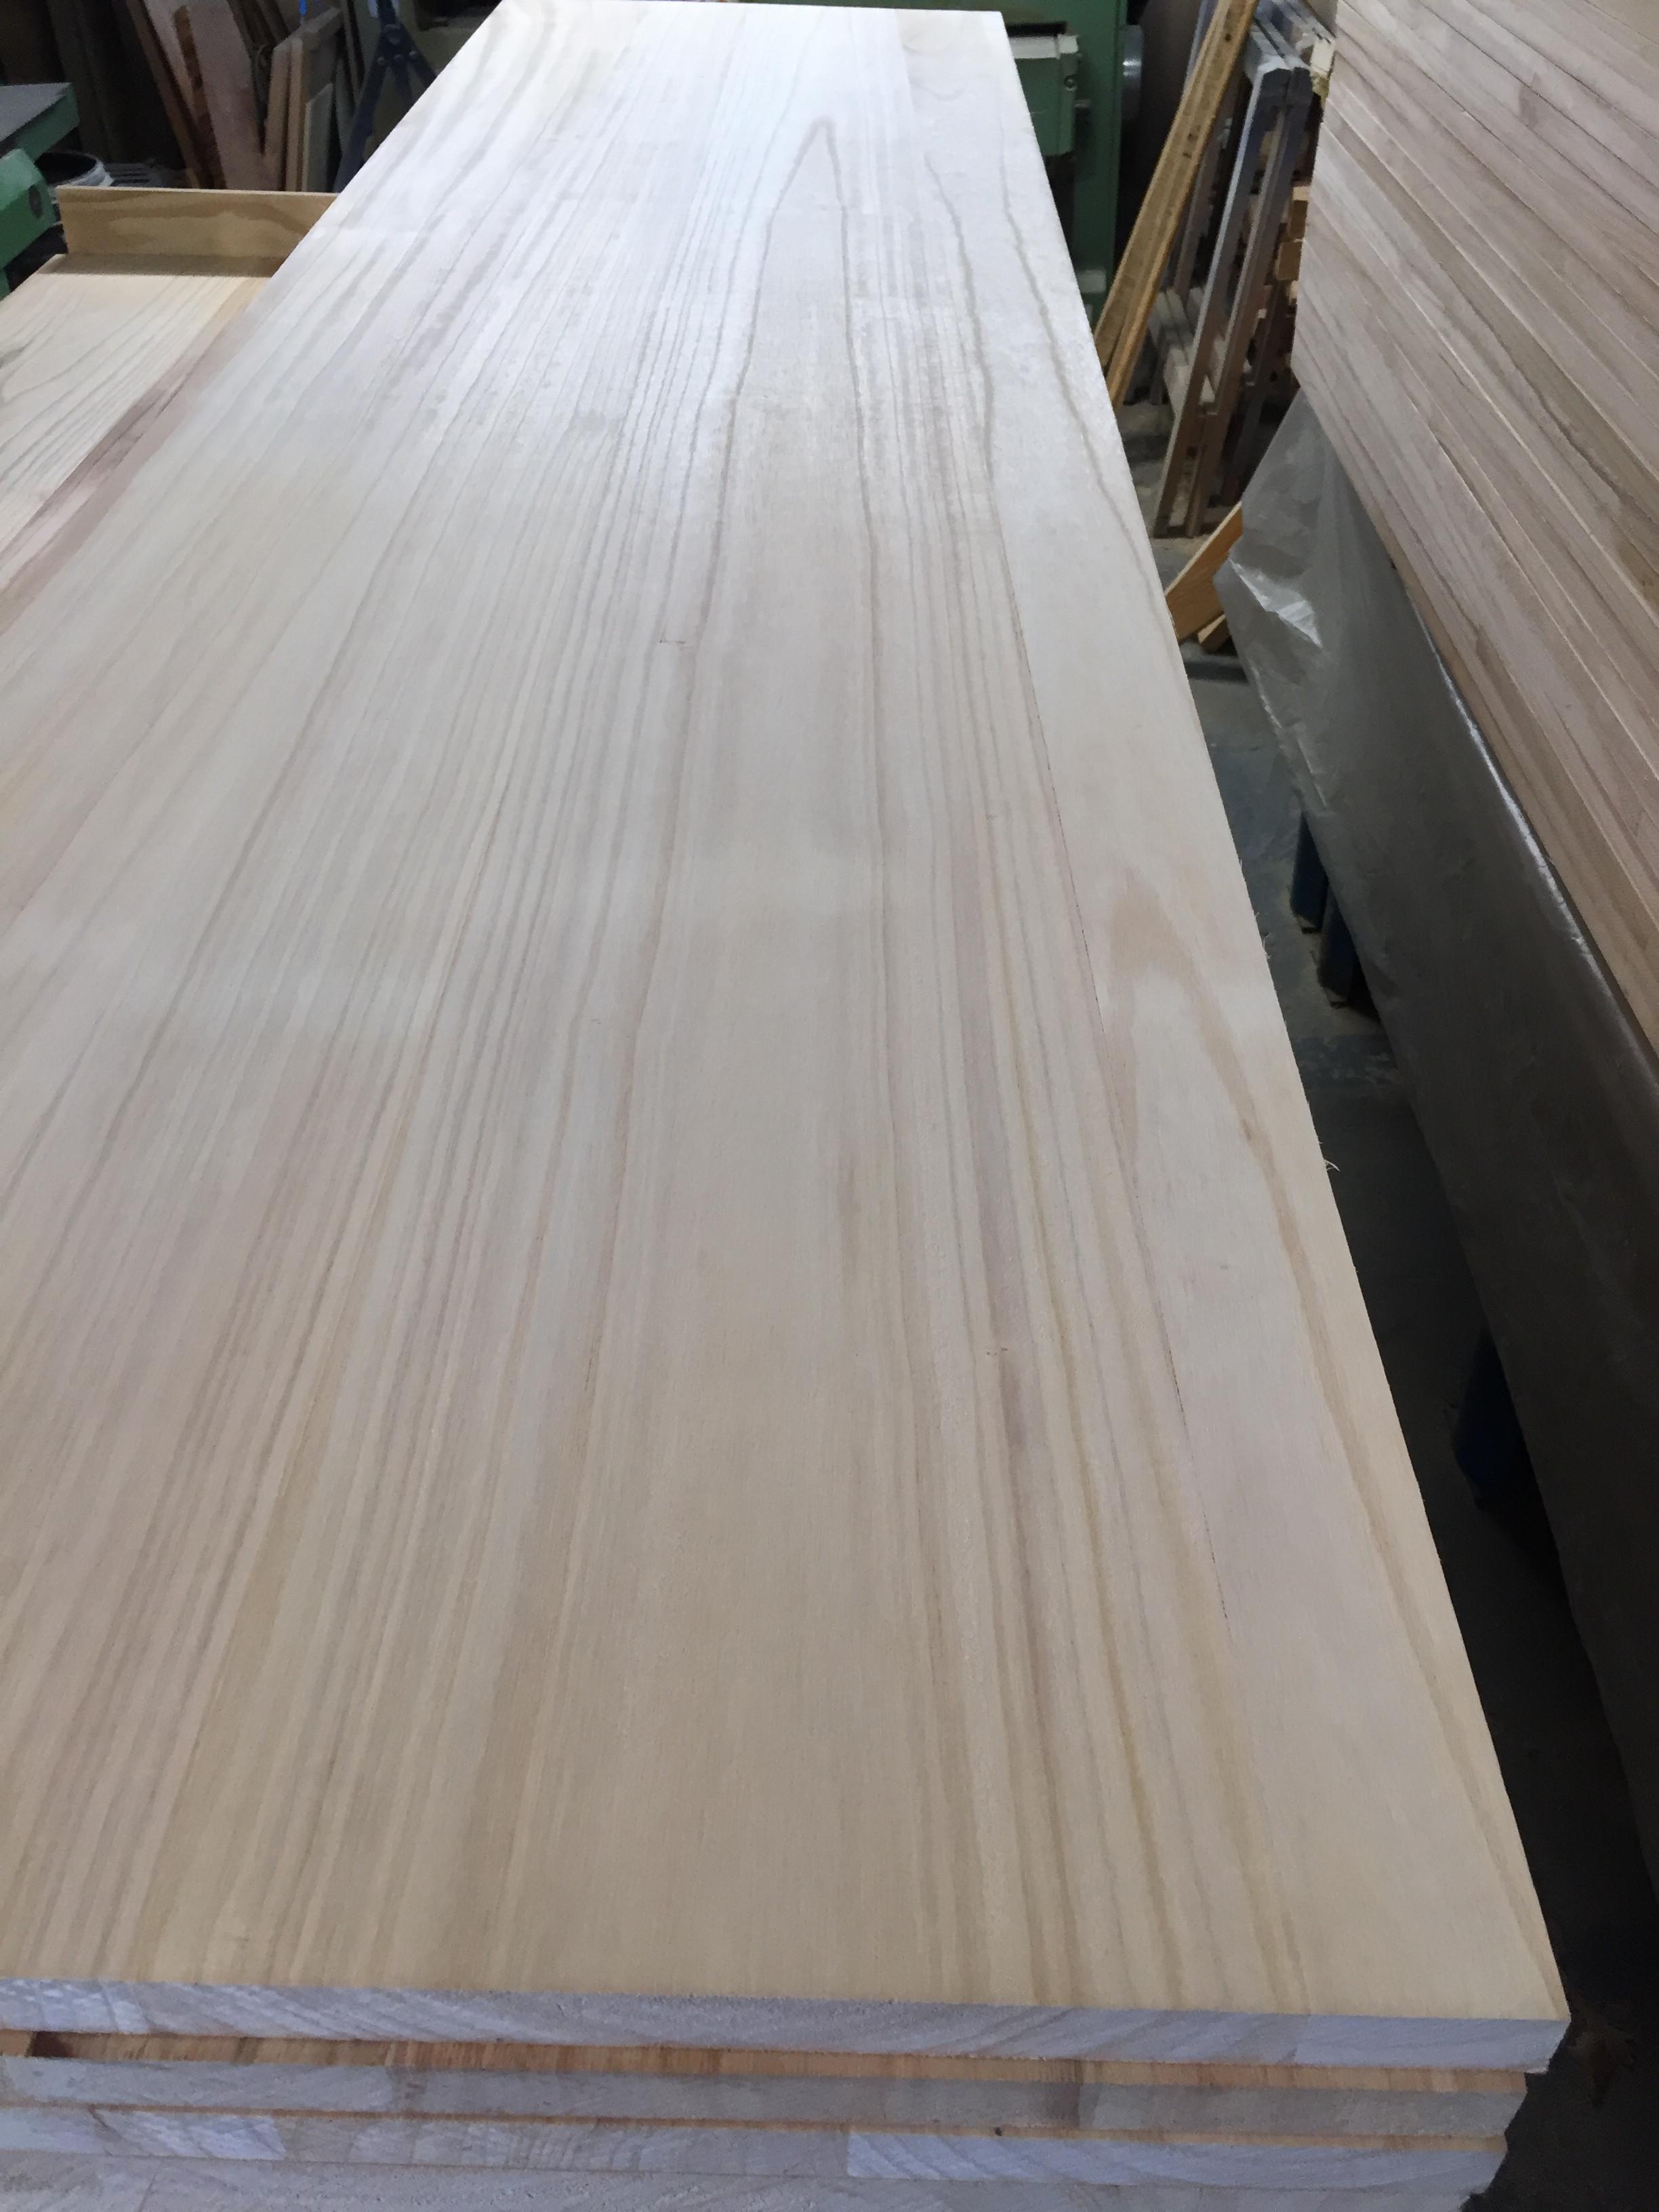 Oak farm style hardwood furniture board